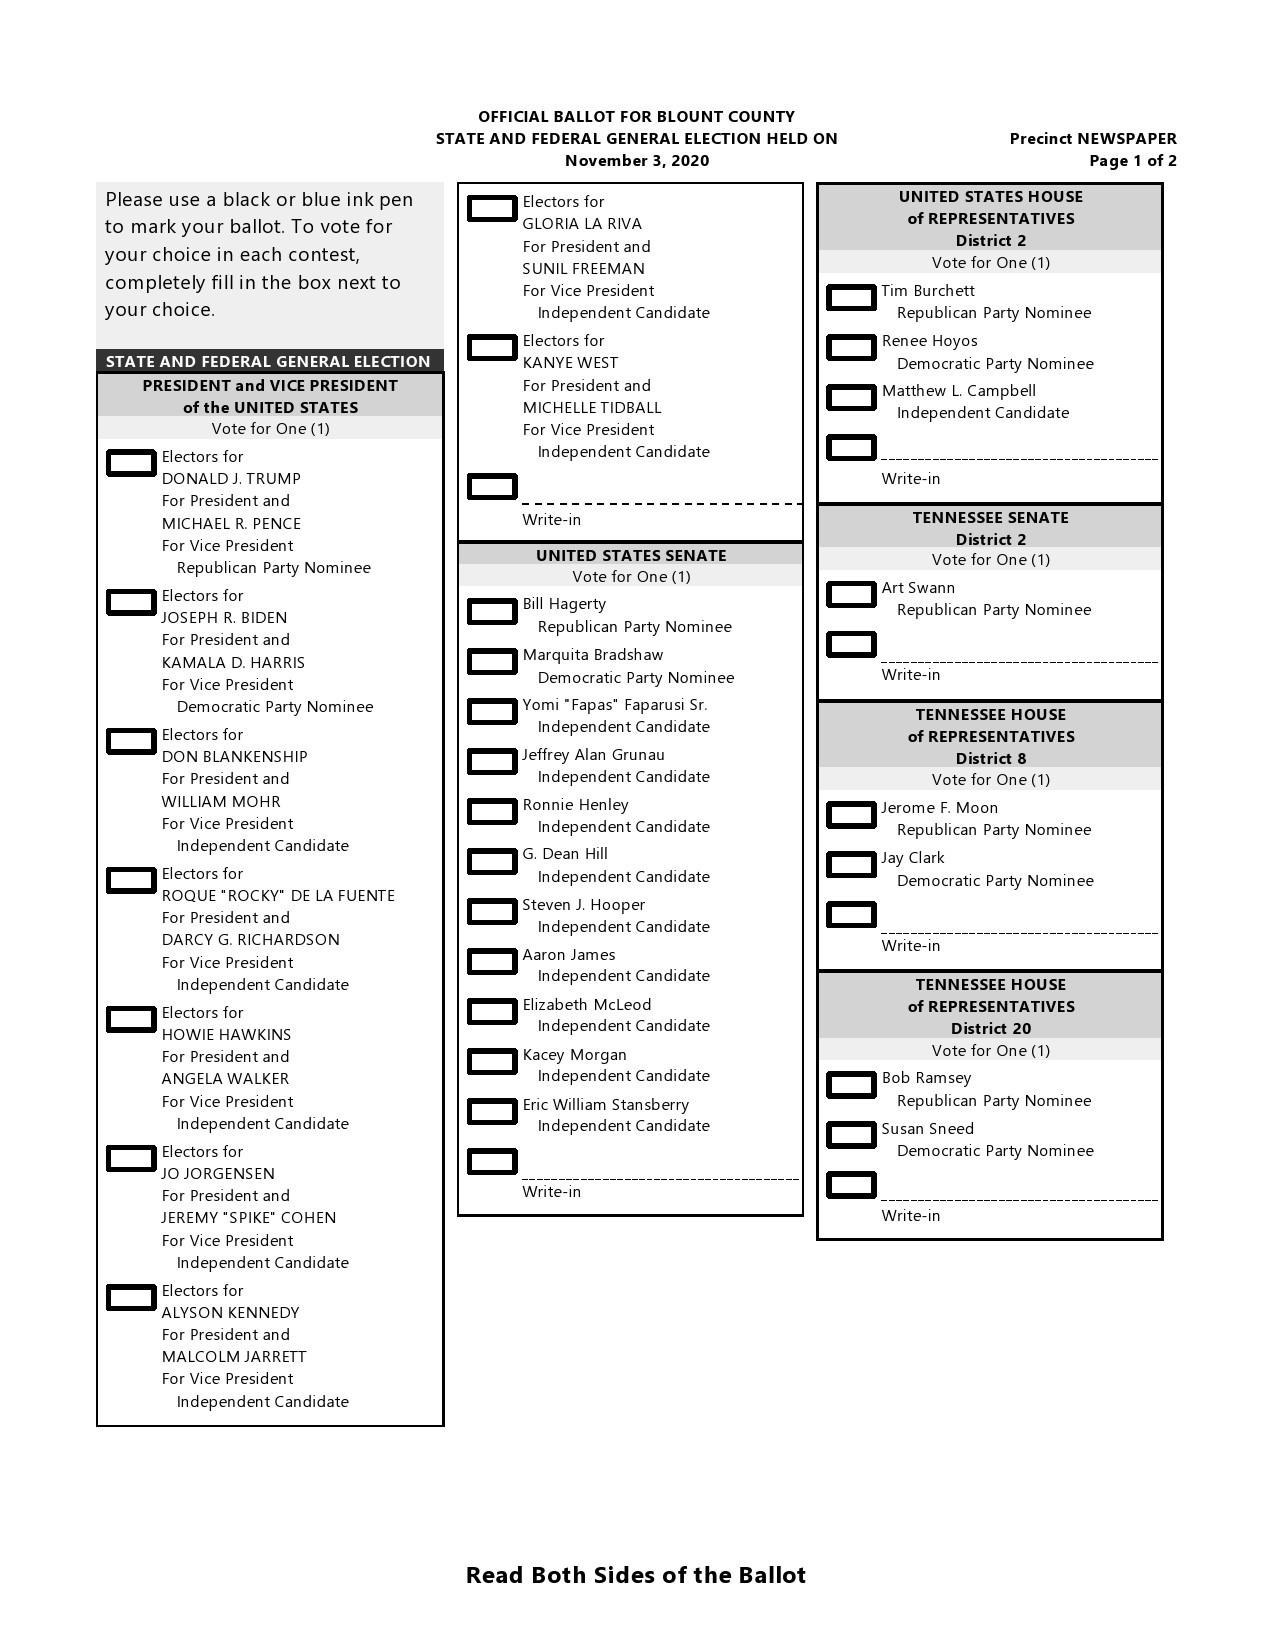 Free ballot template 28